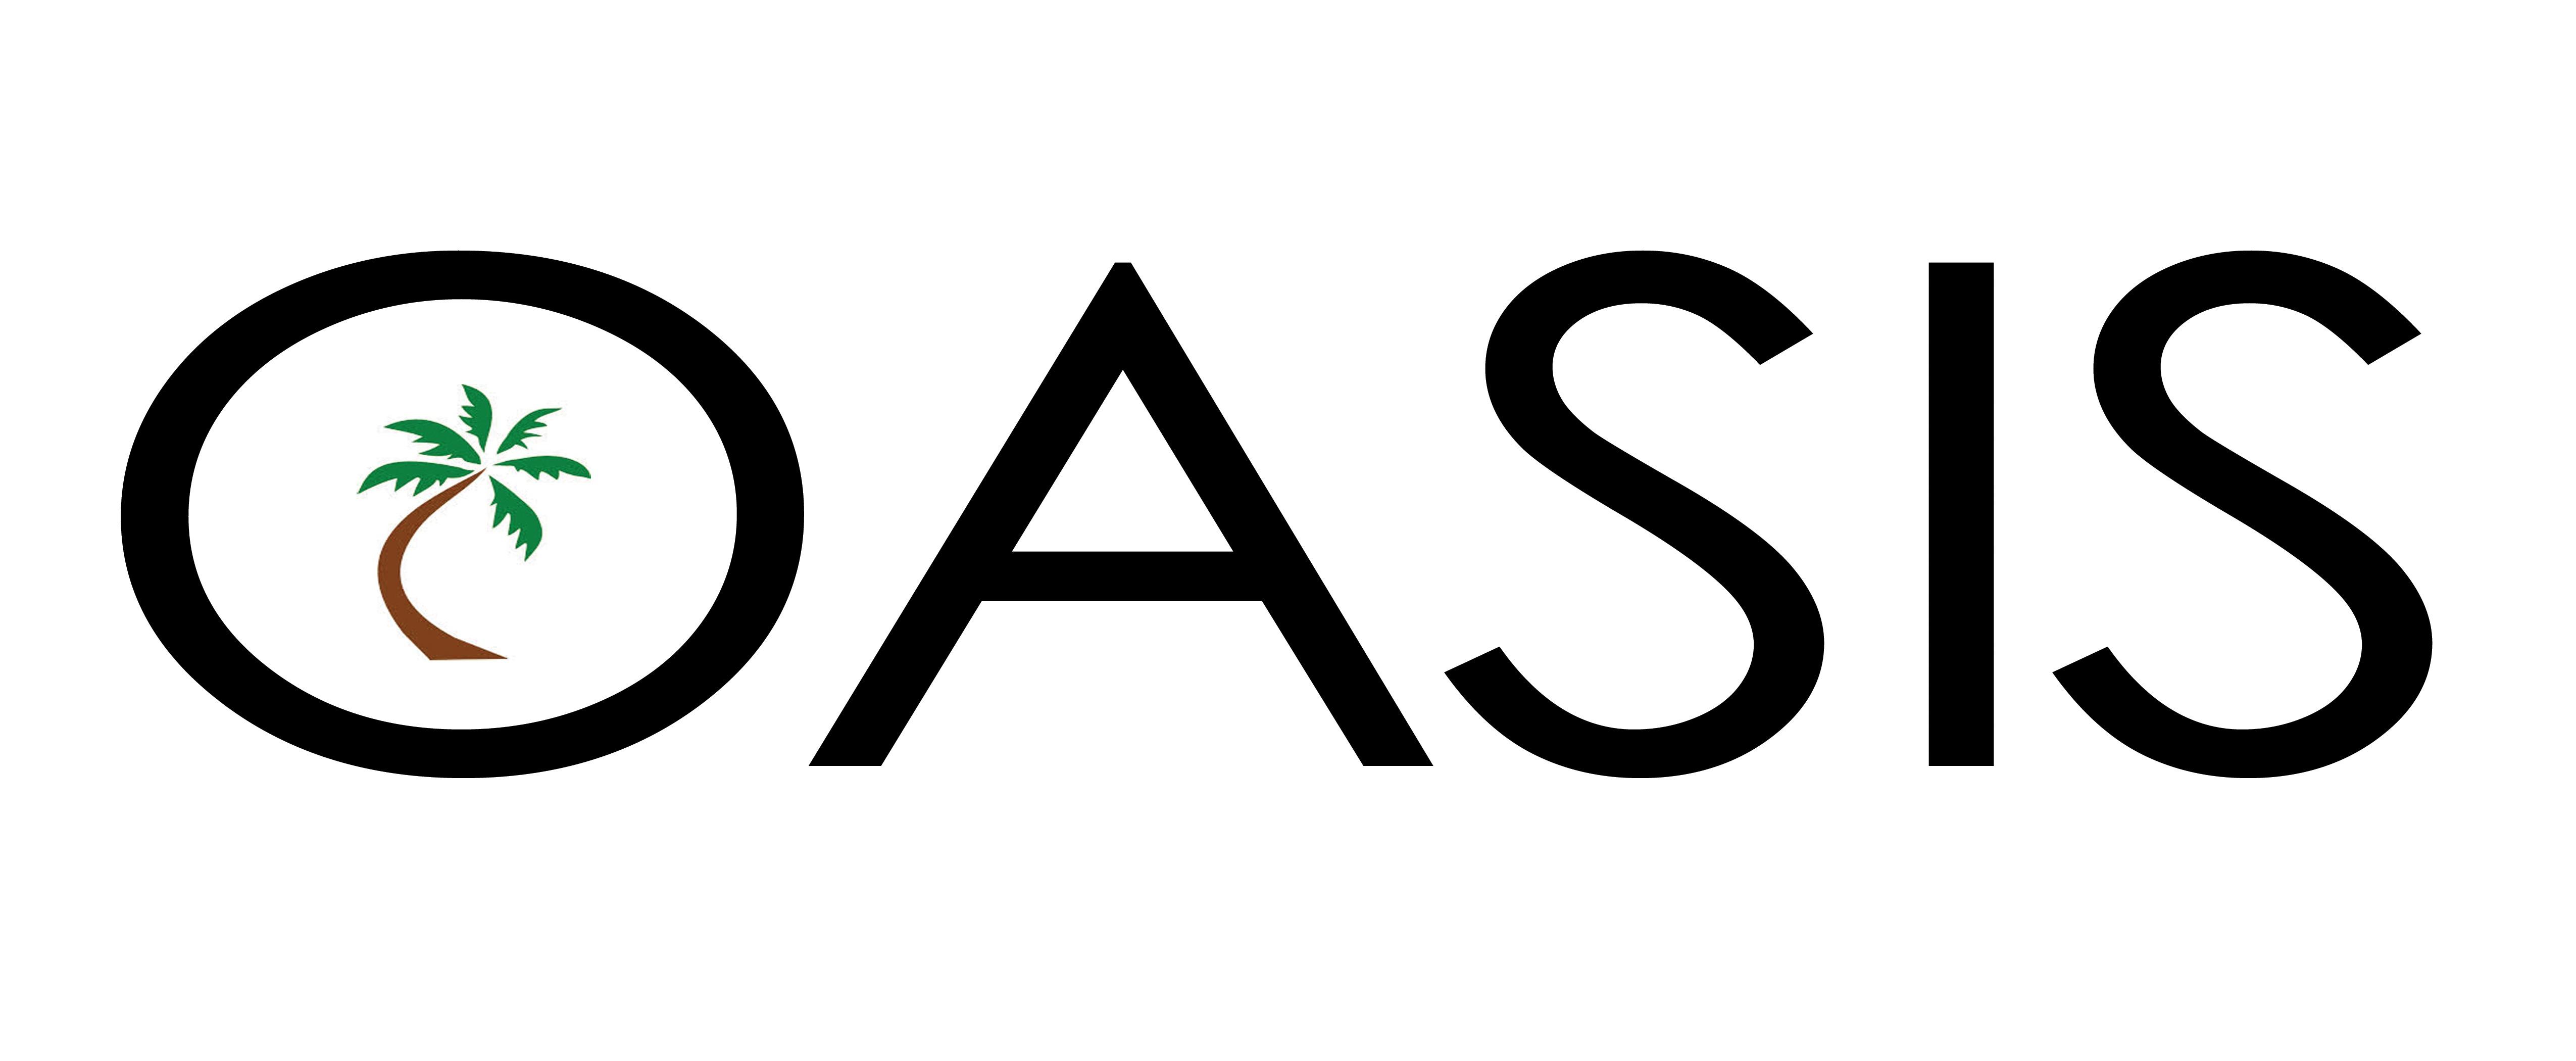 oasis outdoor tv - 70 inch model - oa70wrod - Home Theatre Photos ...